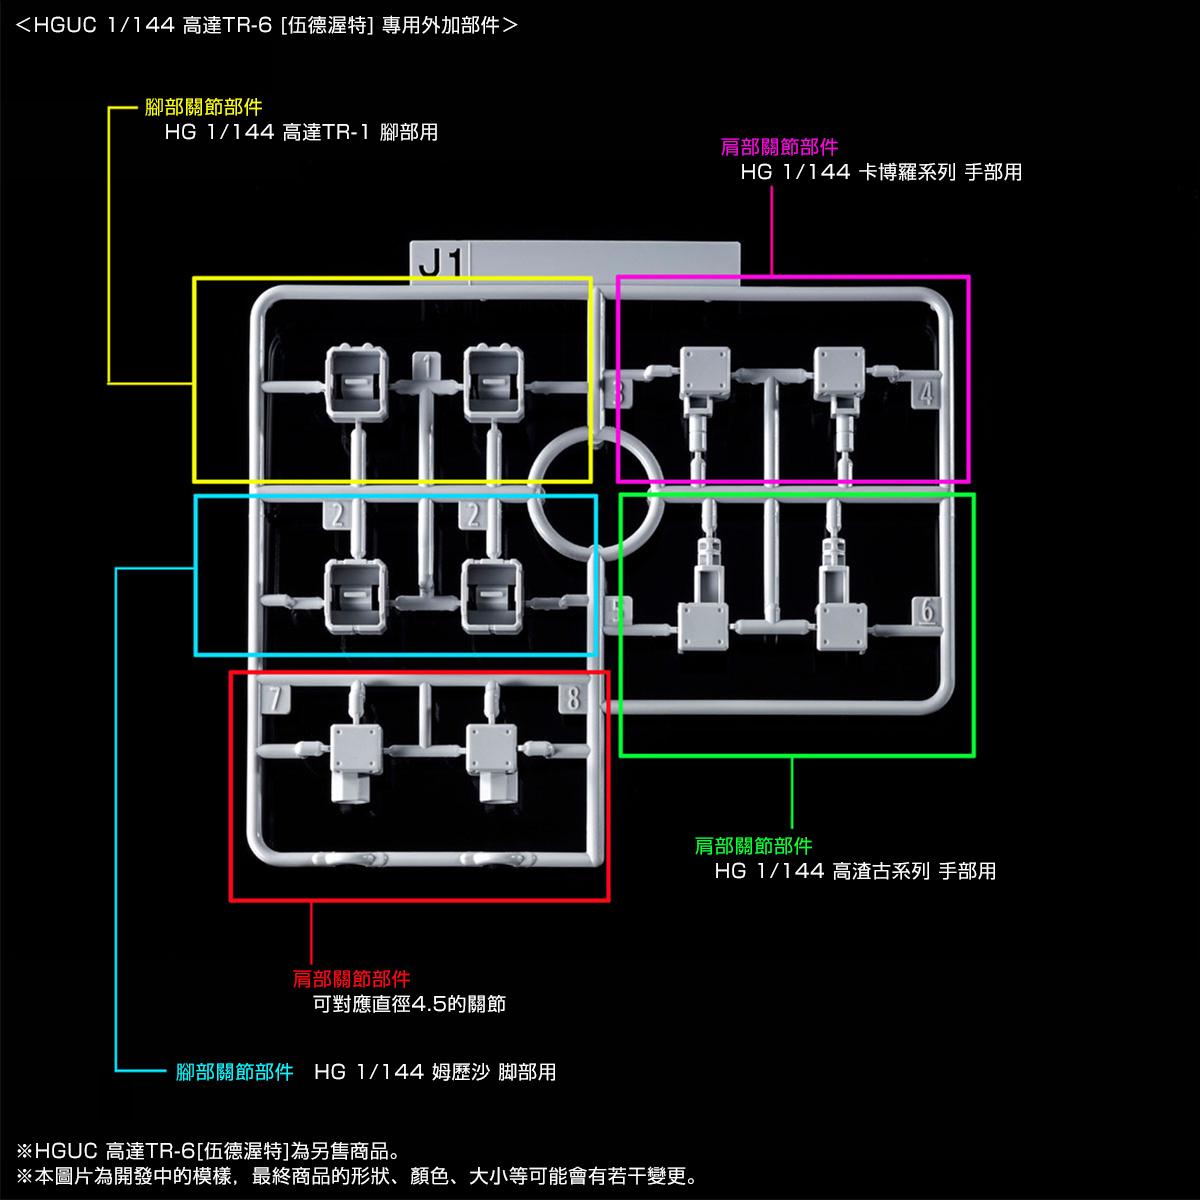 HG 1/144 GUNDAM TR-1 [HAZEL CUSTOM] & EXPANSION PARTS SET for GUNDAM TR-6 [2019年9月發送]